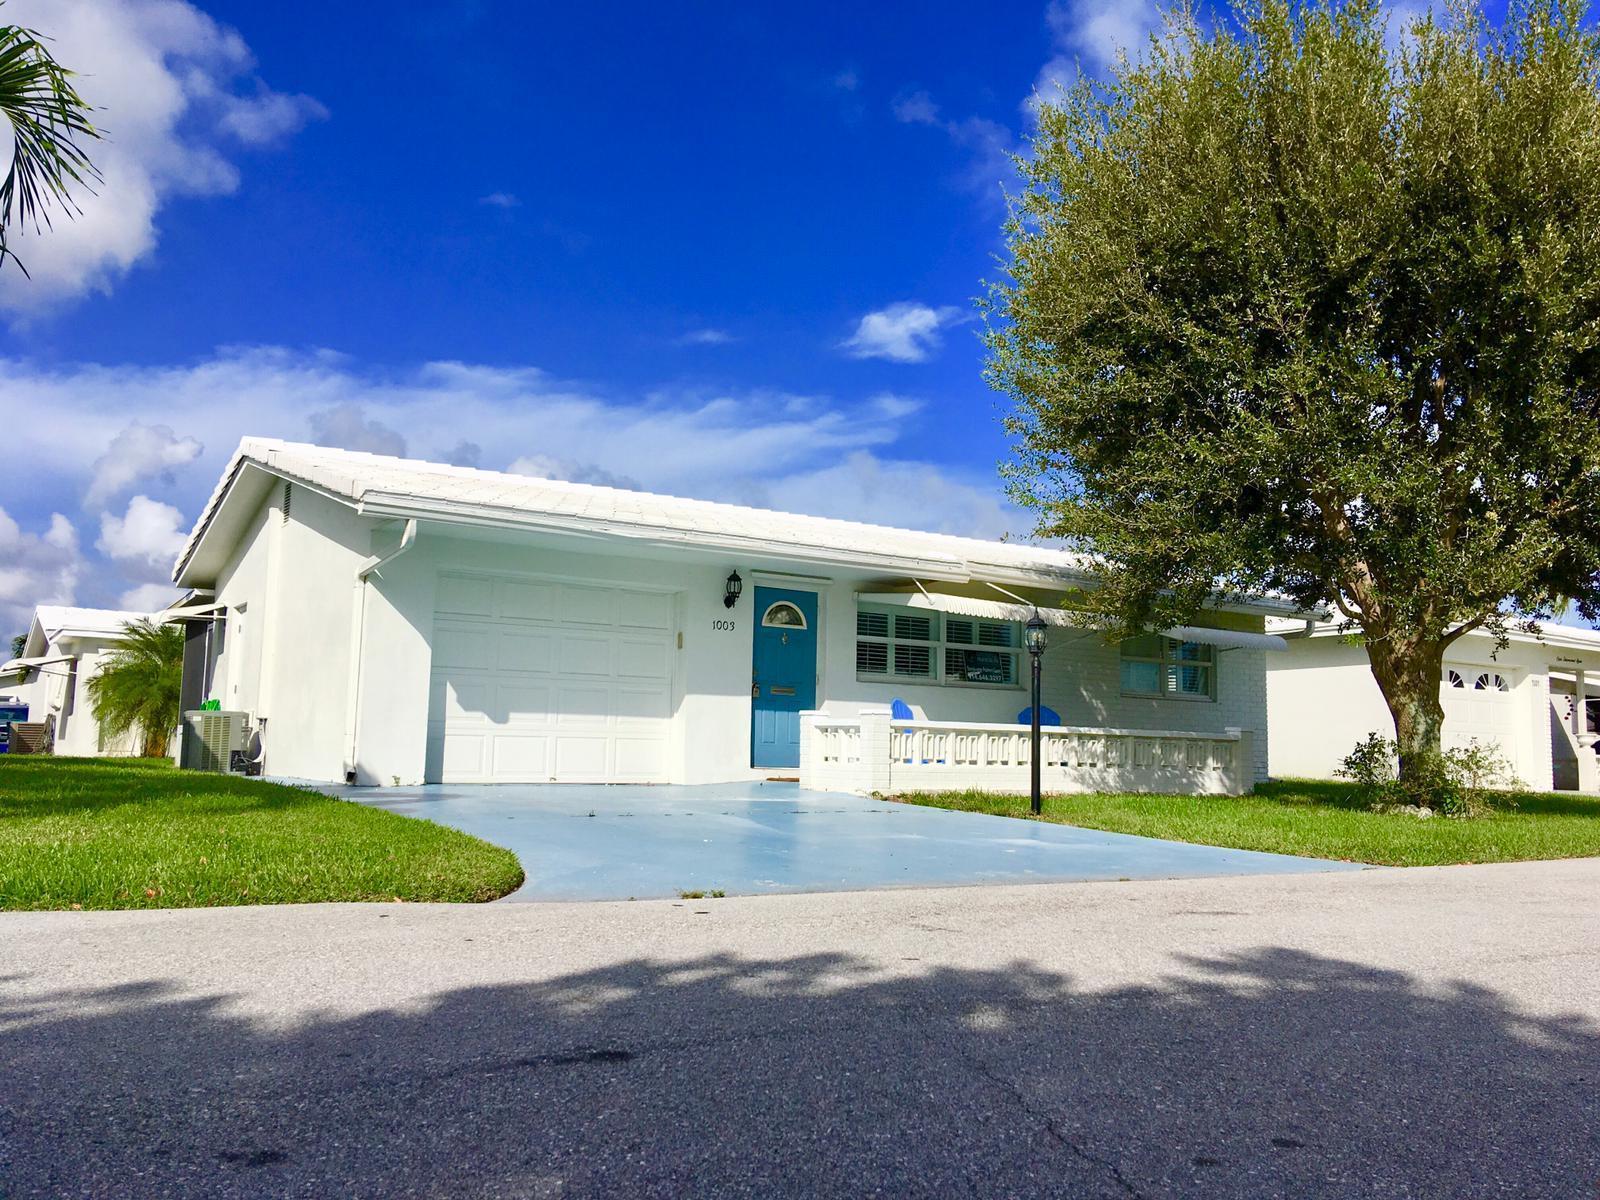 1003 Siesta Avenue, Boynton Beach, Florida 33426, 2 Bedrooms Bedrooms, ,1.1 BathroomsBathrooms,Single Family,For Sale,Siesta,RX-10465488